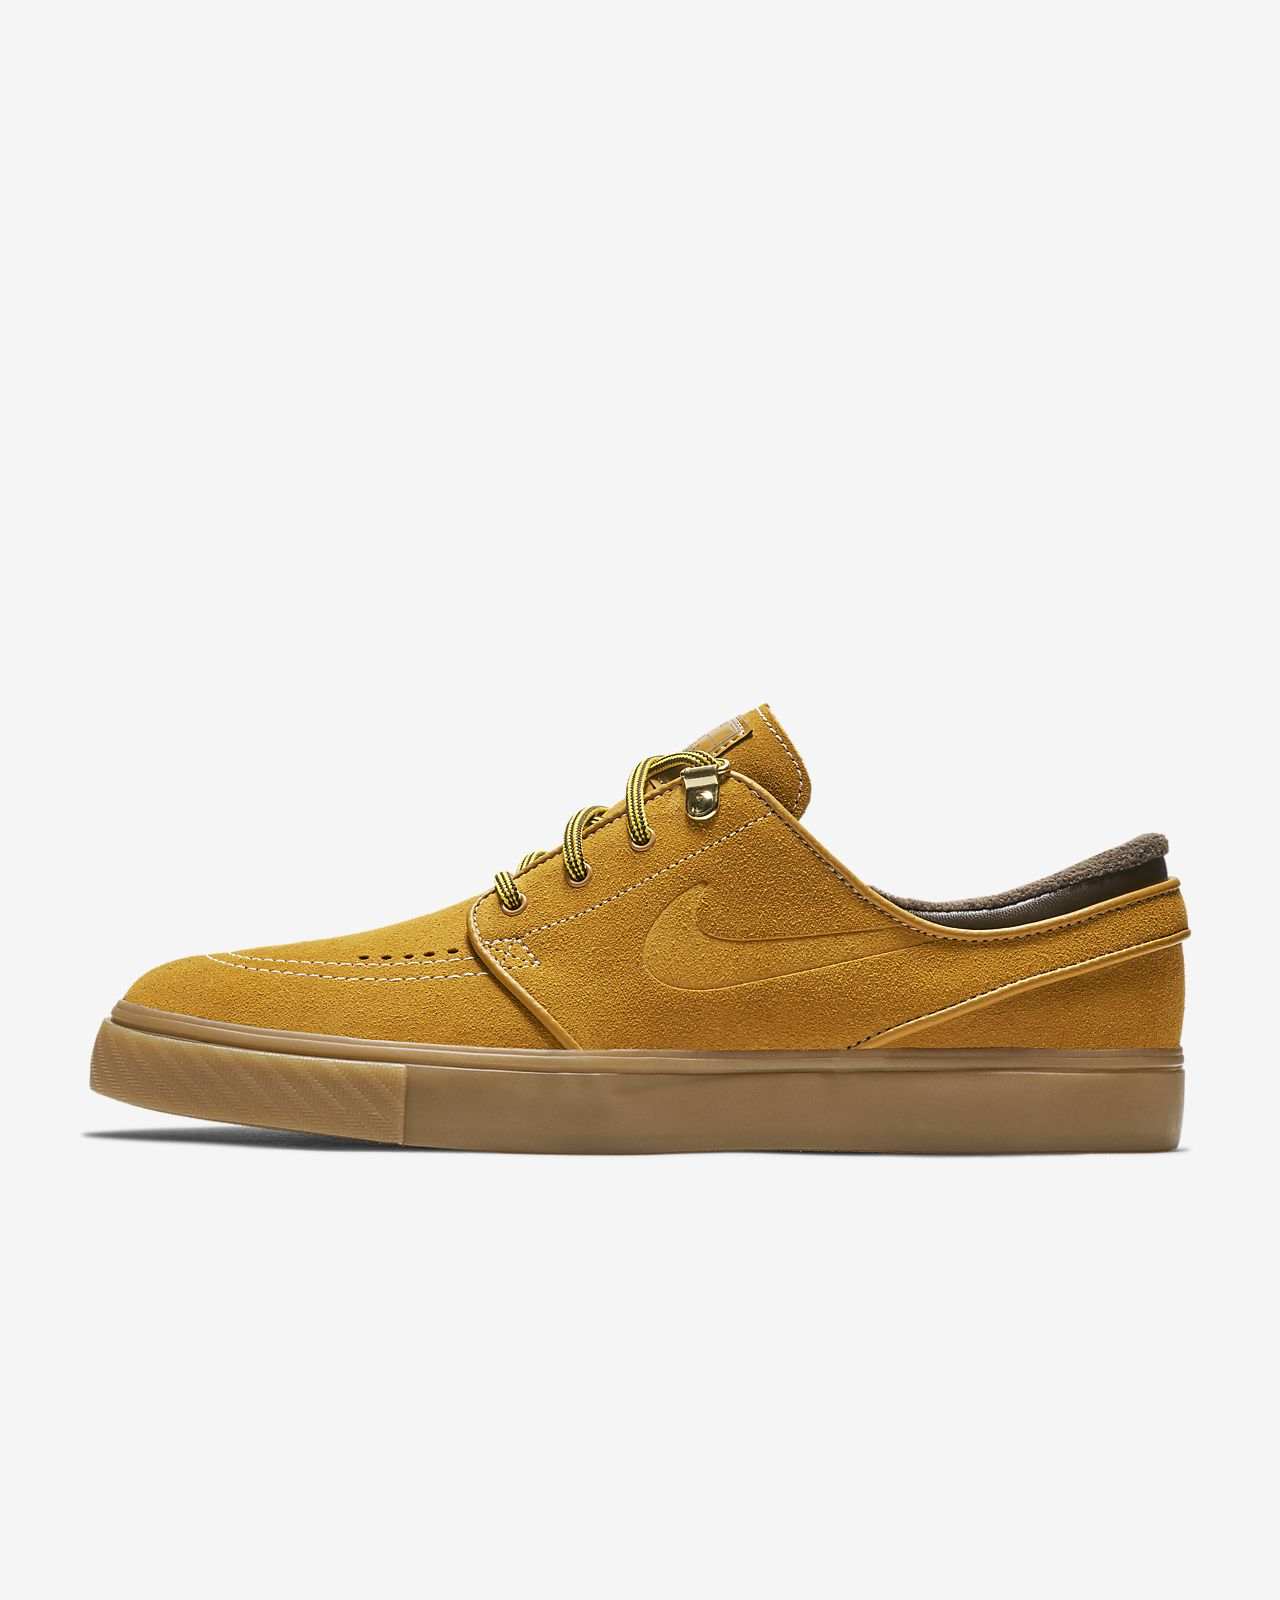 Nike SB Zoom Janoski Premium Kaykay Ayakkabısı